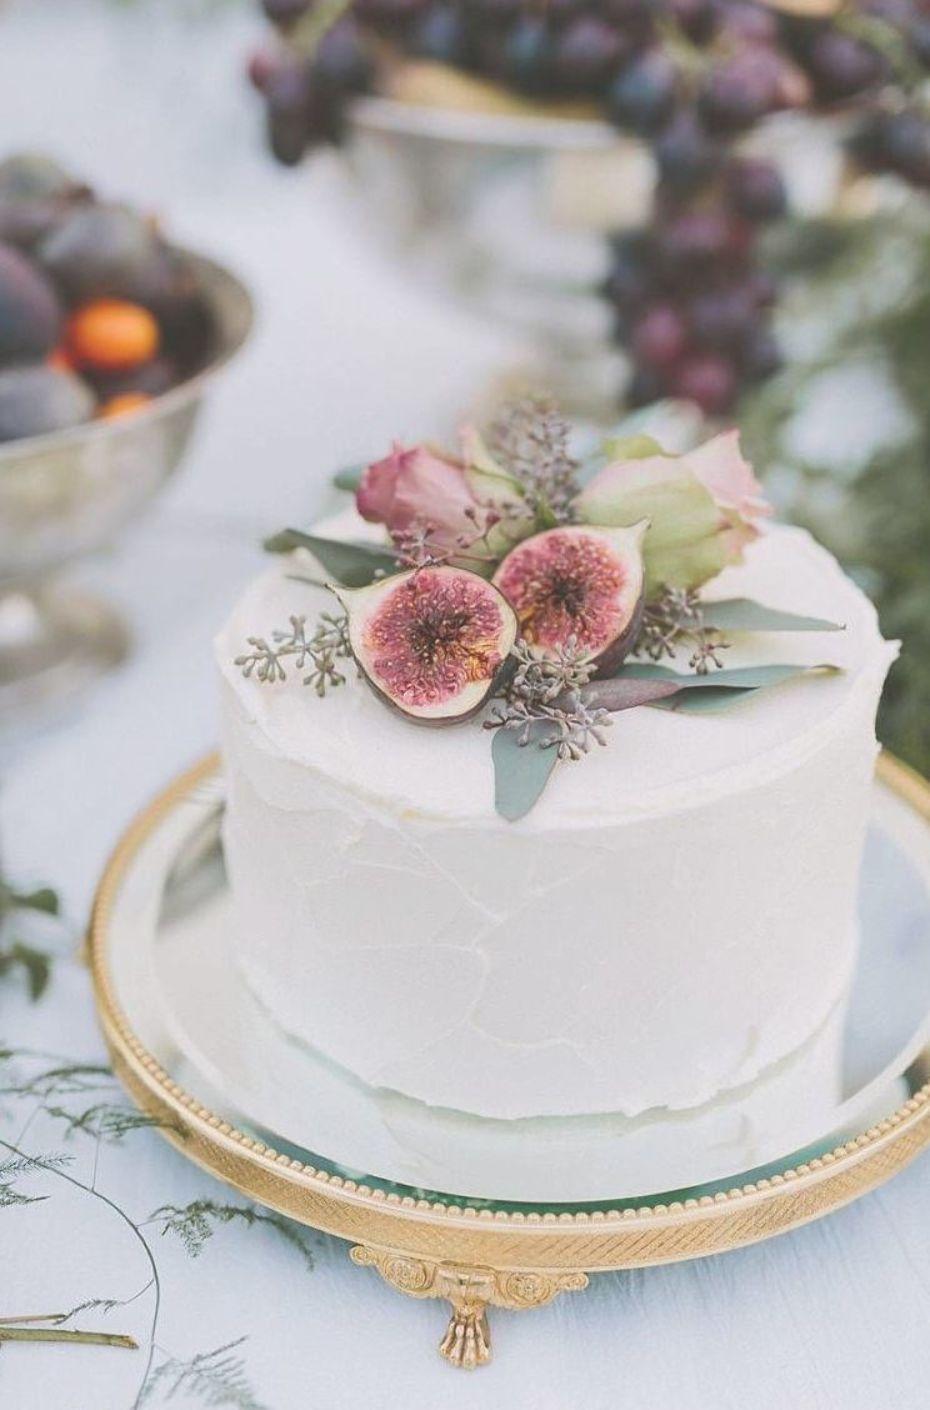 Small Wedding Cake Ideas A Practical Wedding Simple Wedding Cake Wedding Cake Stands Modern Wedding Cake